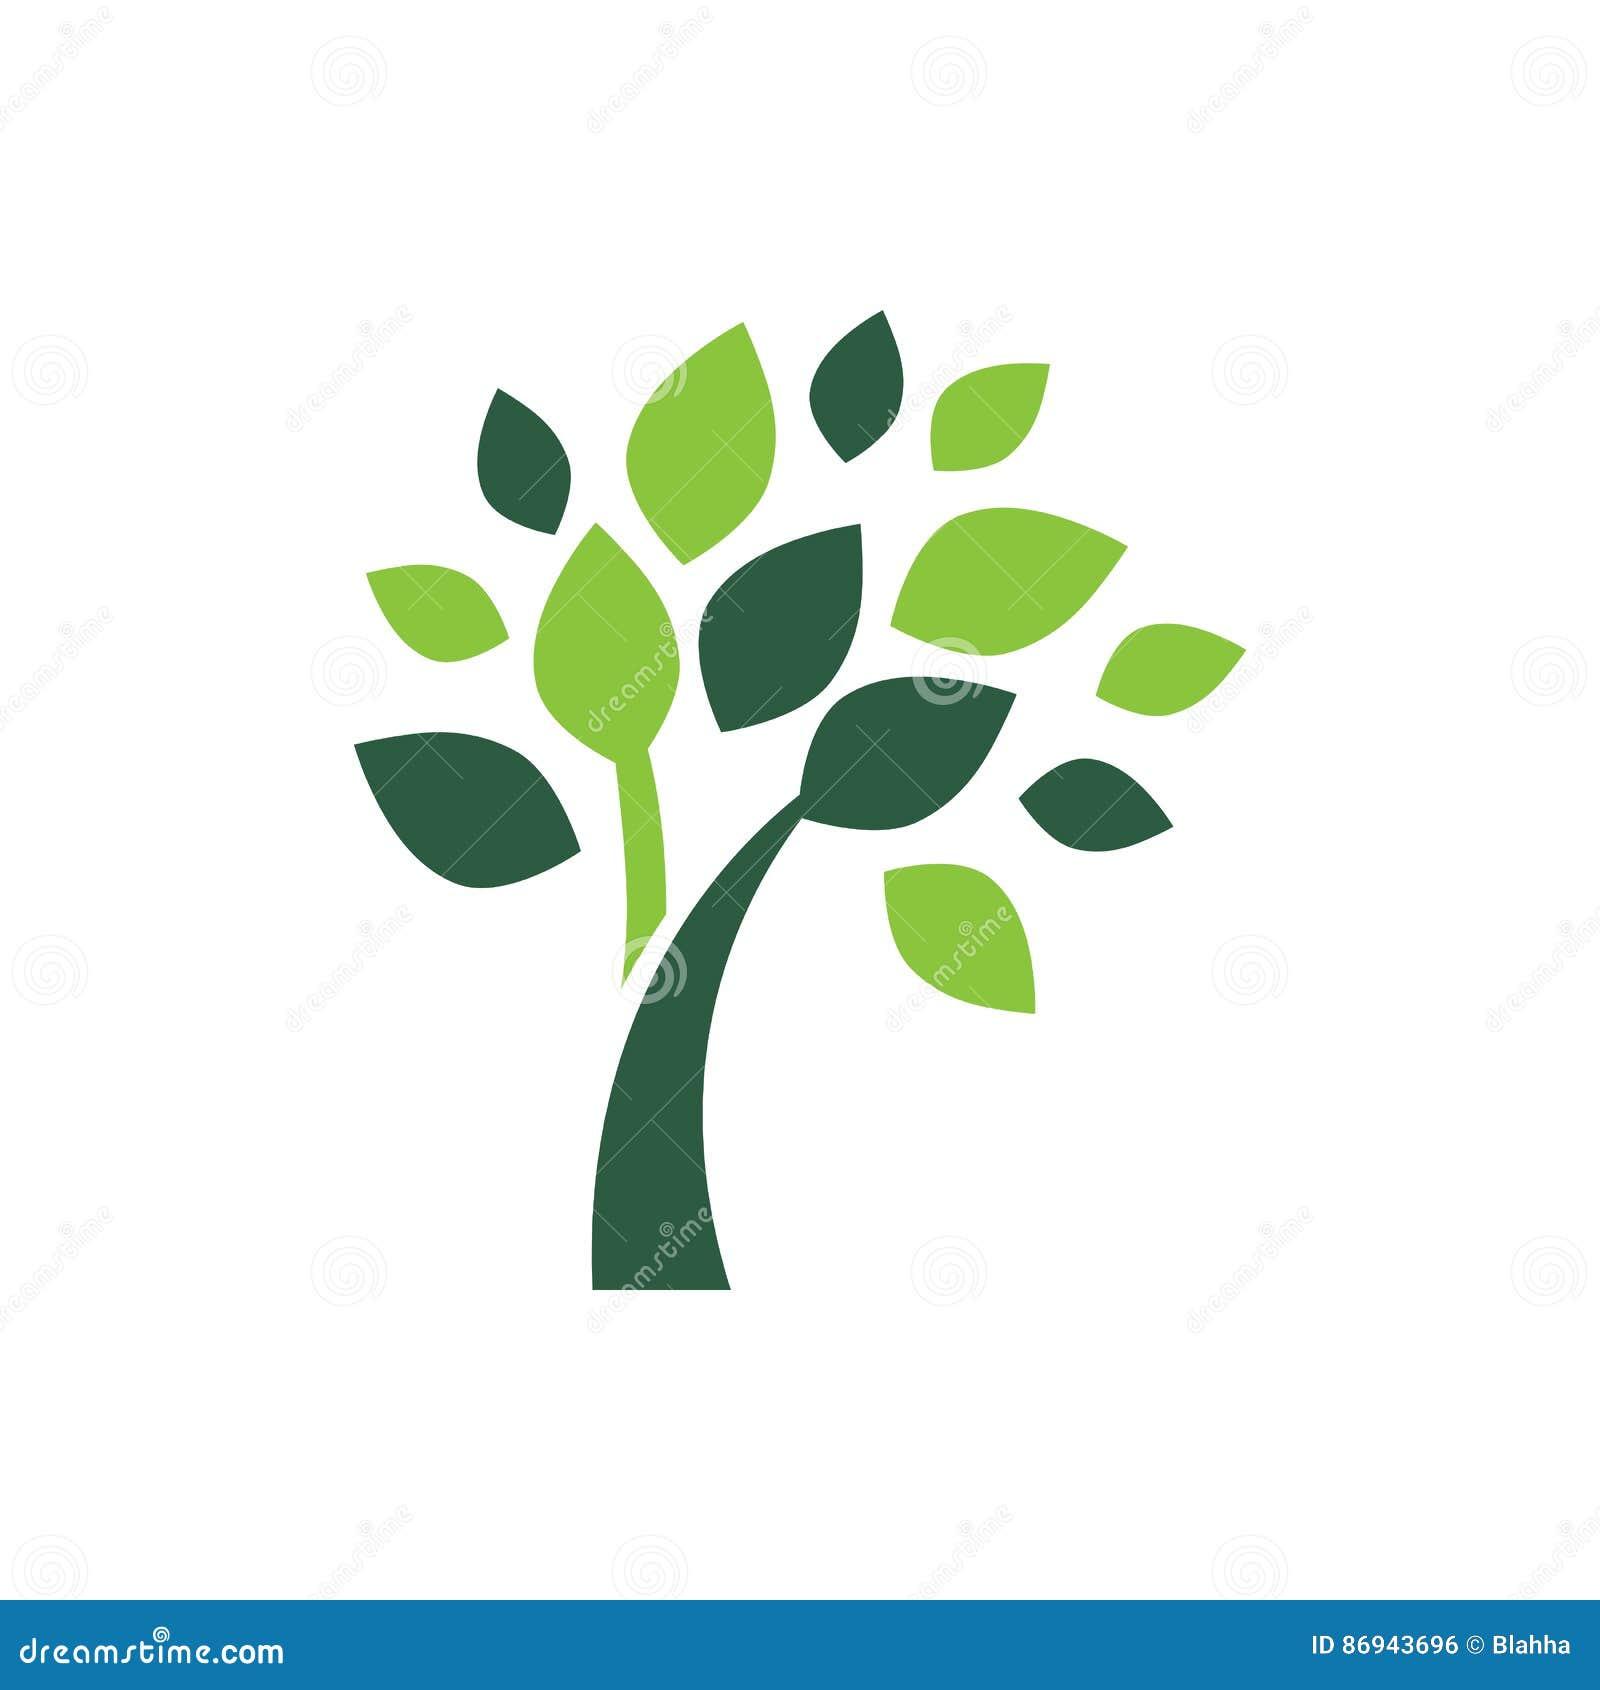 Minimalist green tree logo symbol stock illustration for Illustration minimaliste